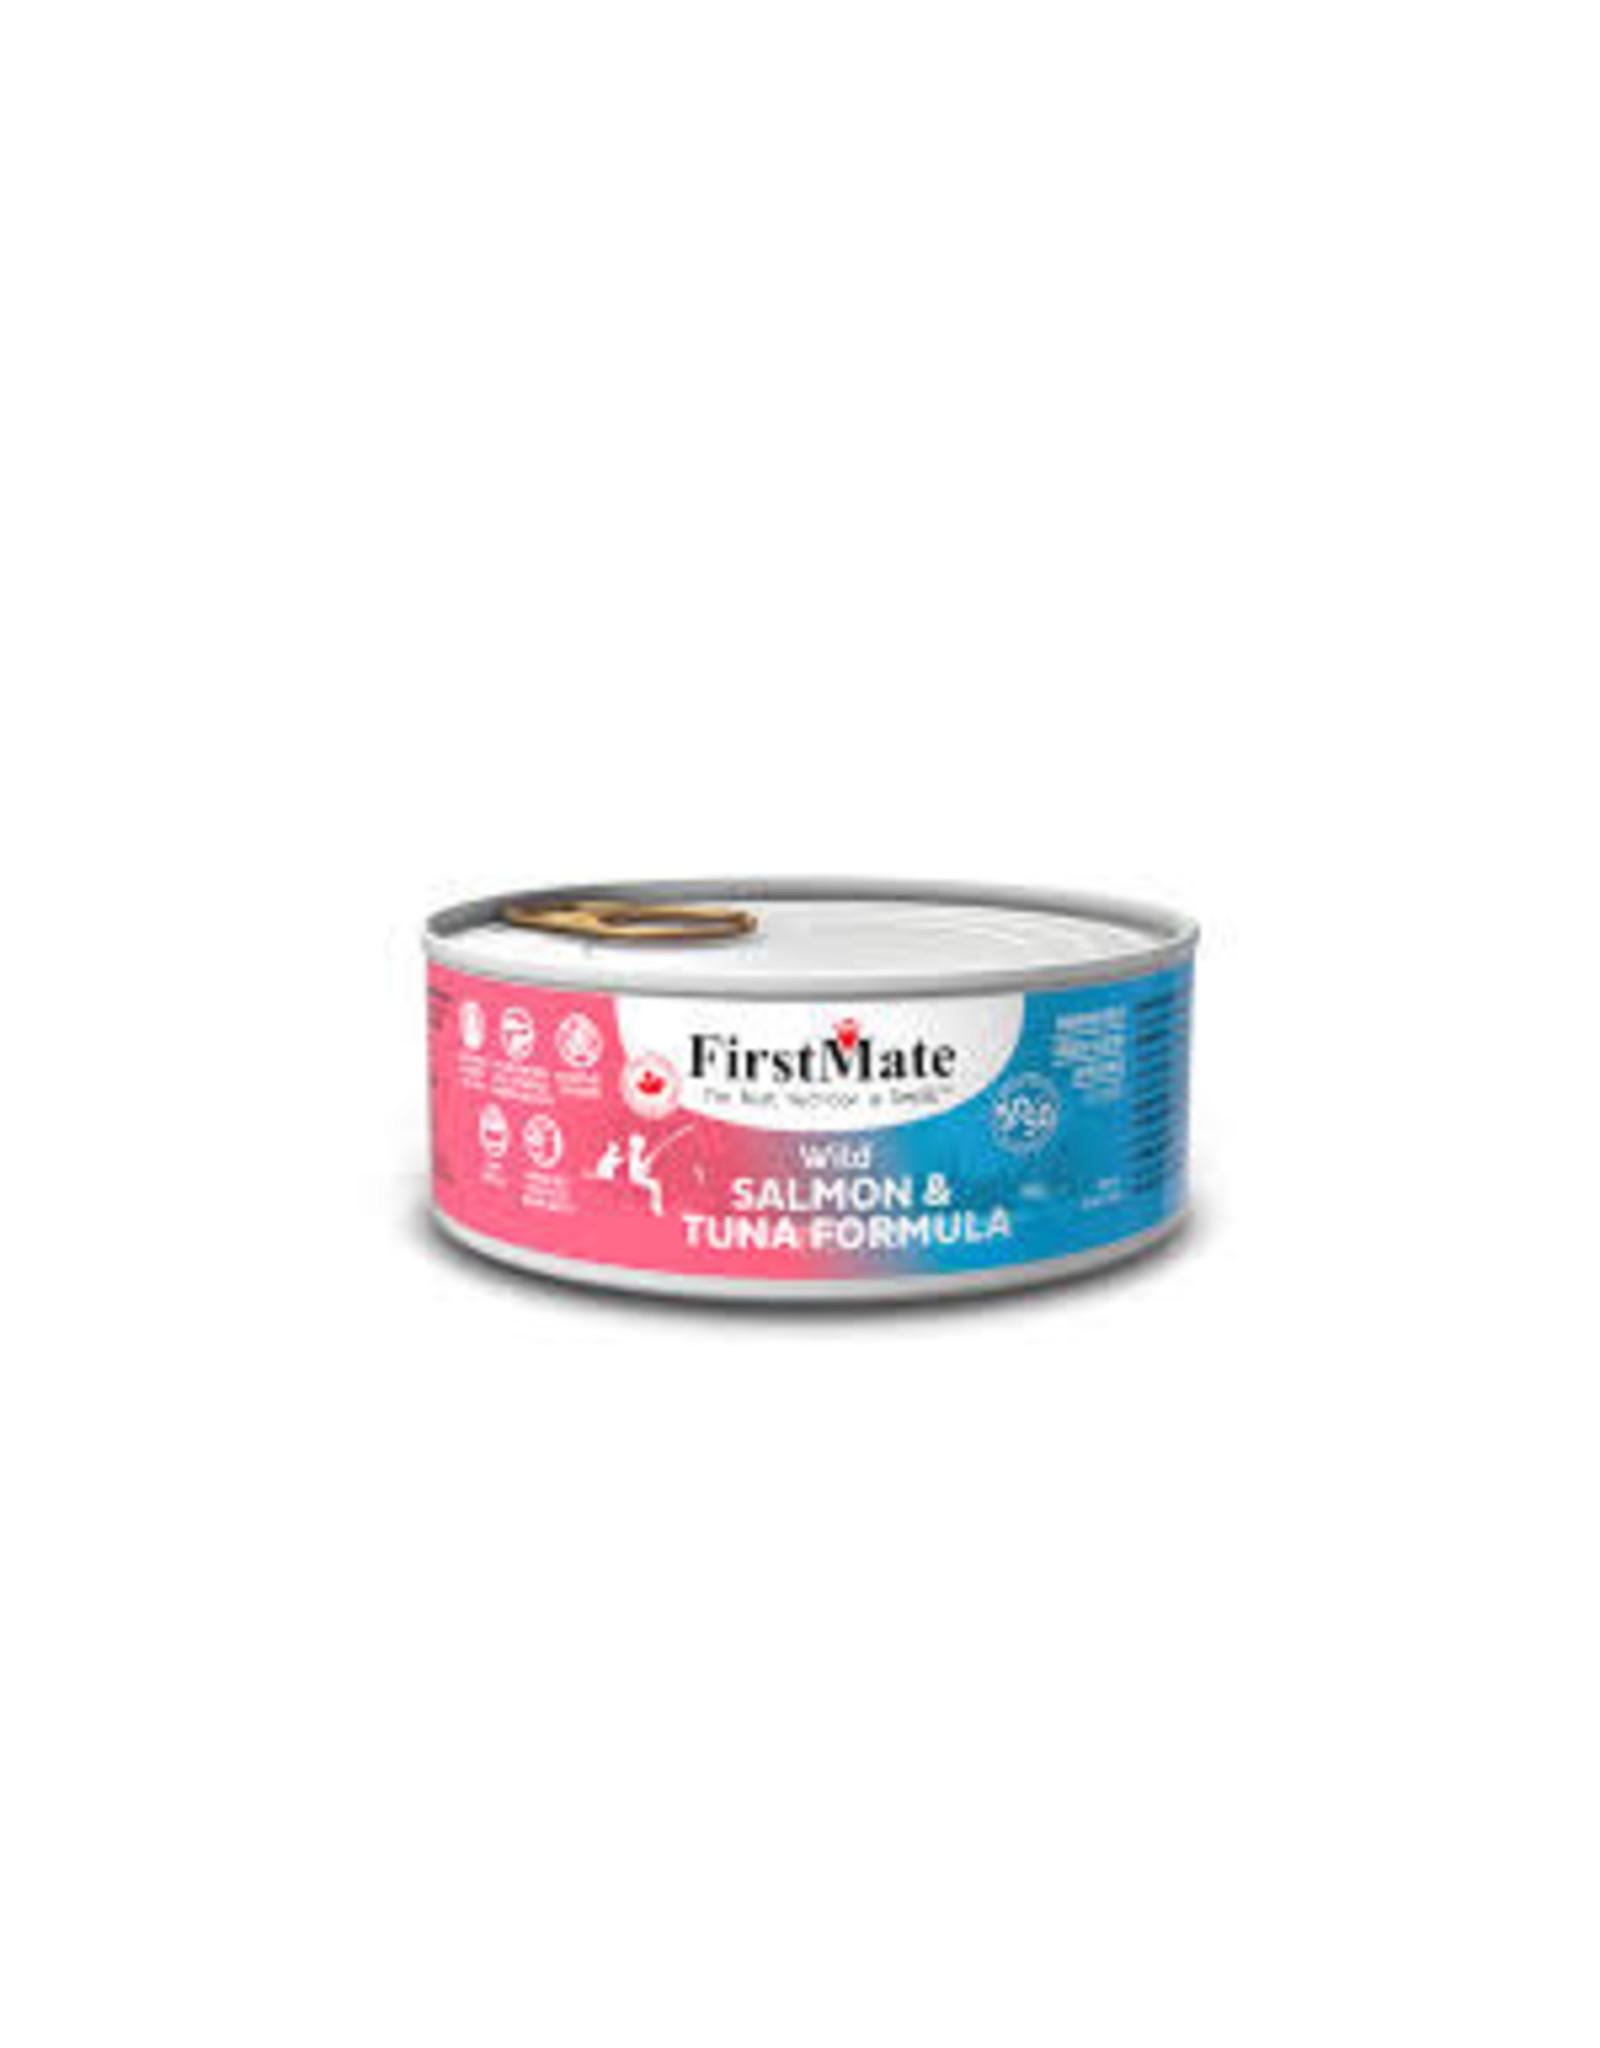 FirstMate FirstMate - GF 50/50 Wild Salmon/Wild Tuna Cat 5.5oz